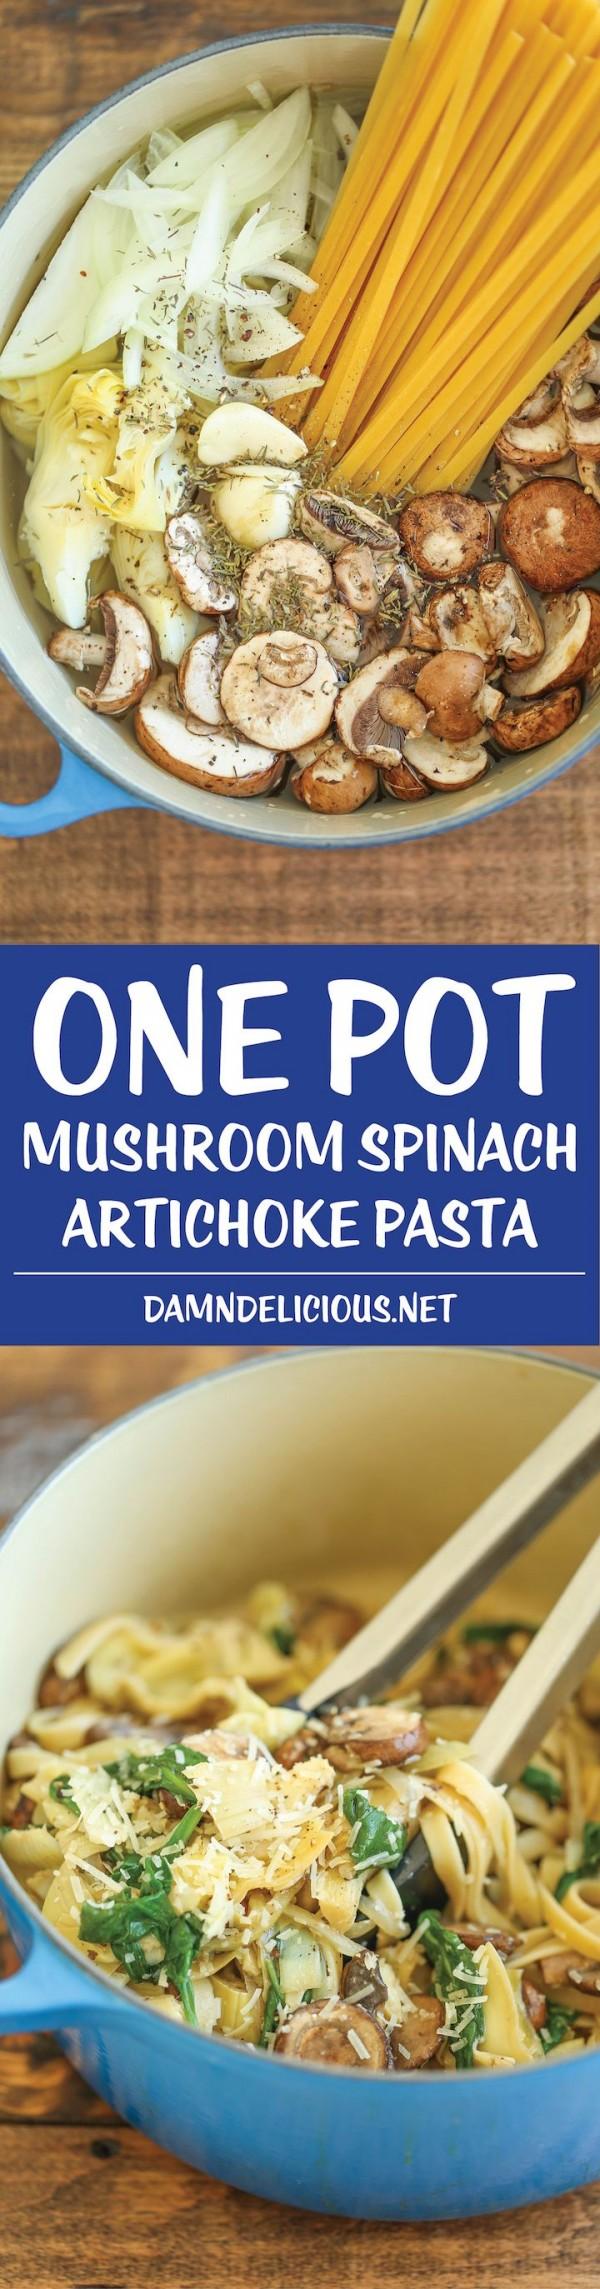 Get the recipe Mushroom Spinach Artichoke Pasta @recipes_to_go